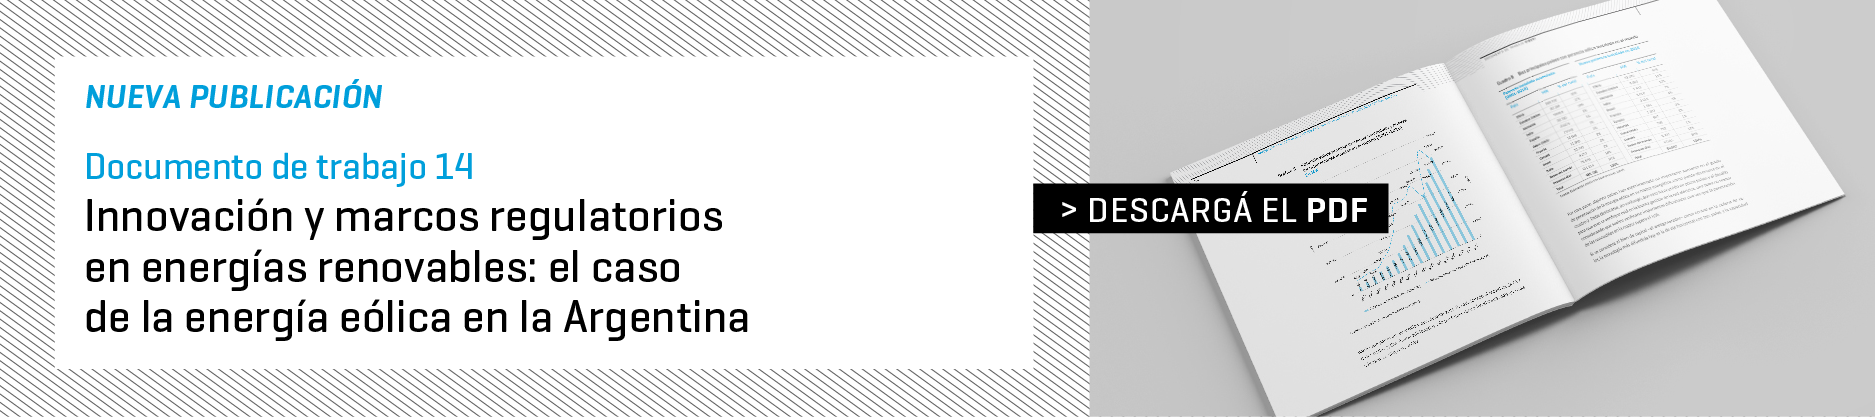 DT14-banner-web-900x200px